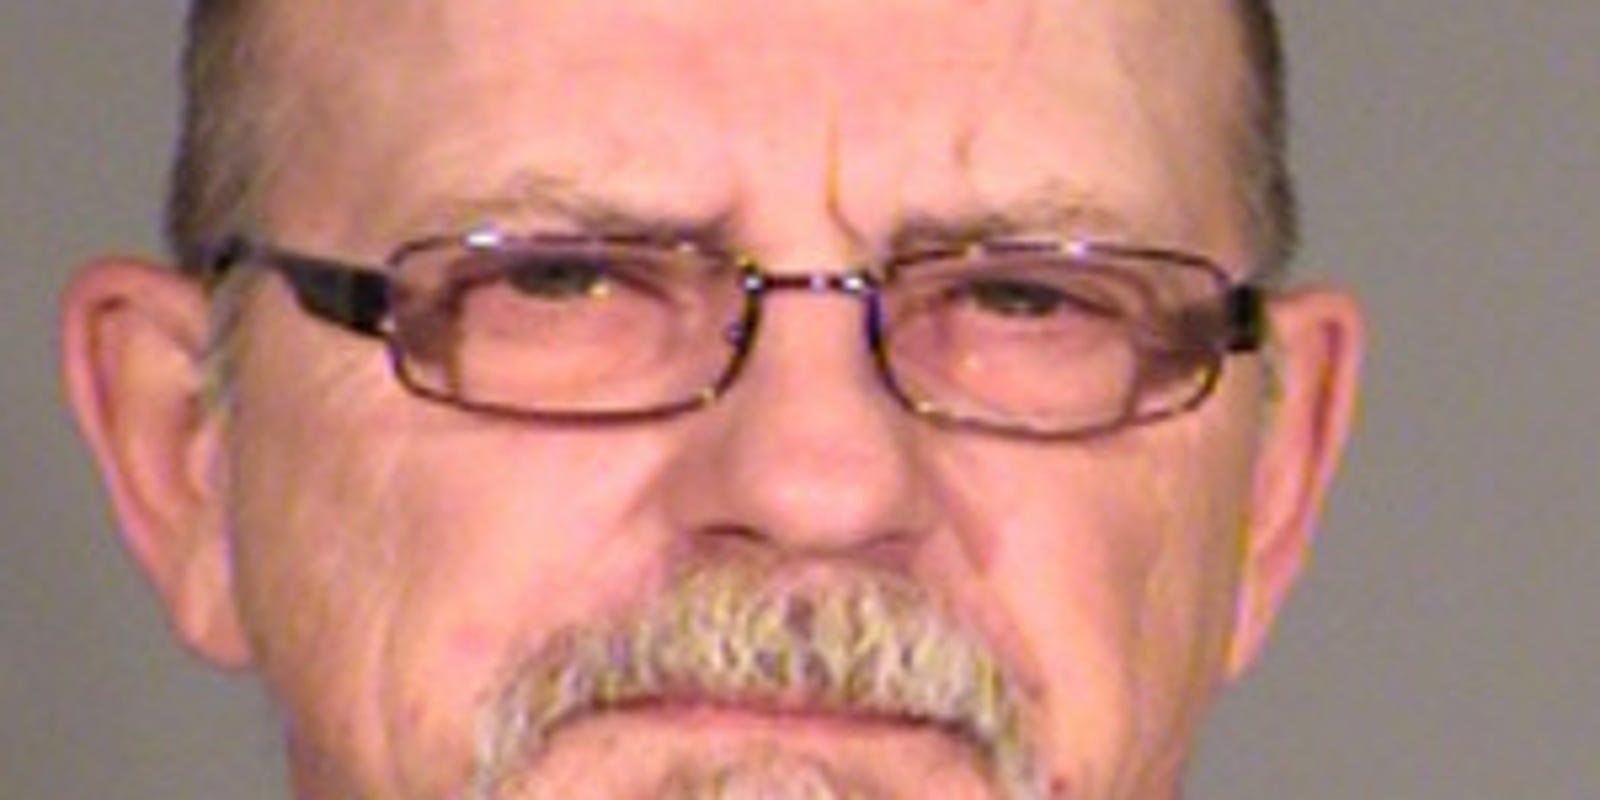 Dennis Brantner loses appeal in reckless homicide conviction of 19-year-old Berit Beck